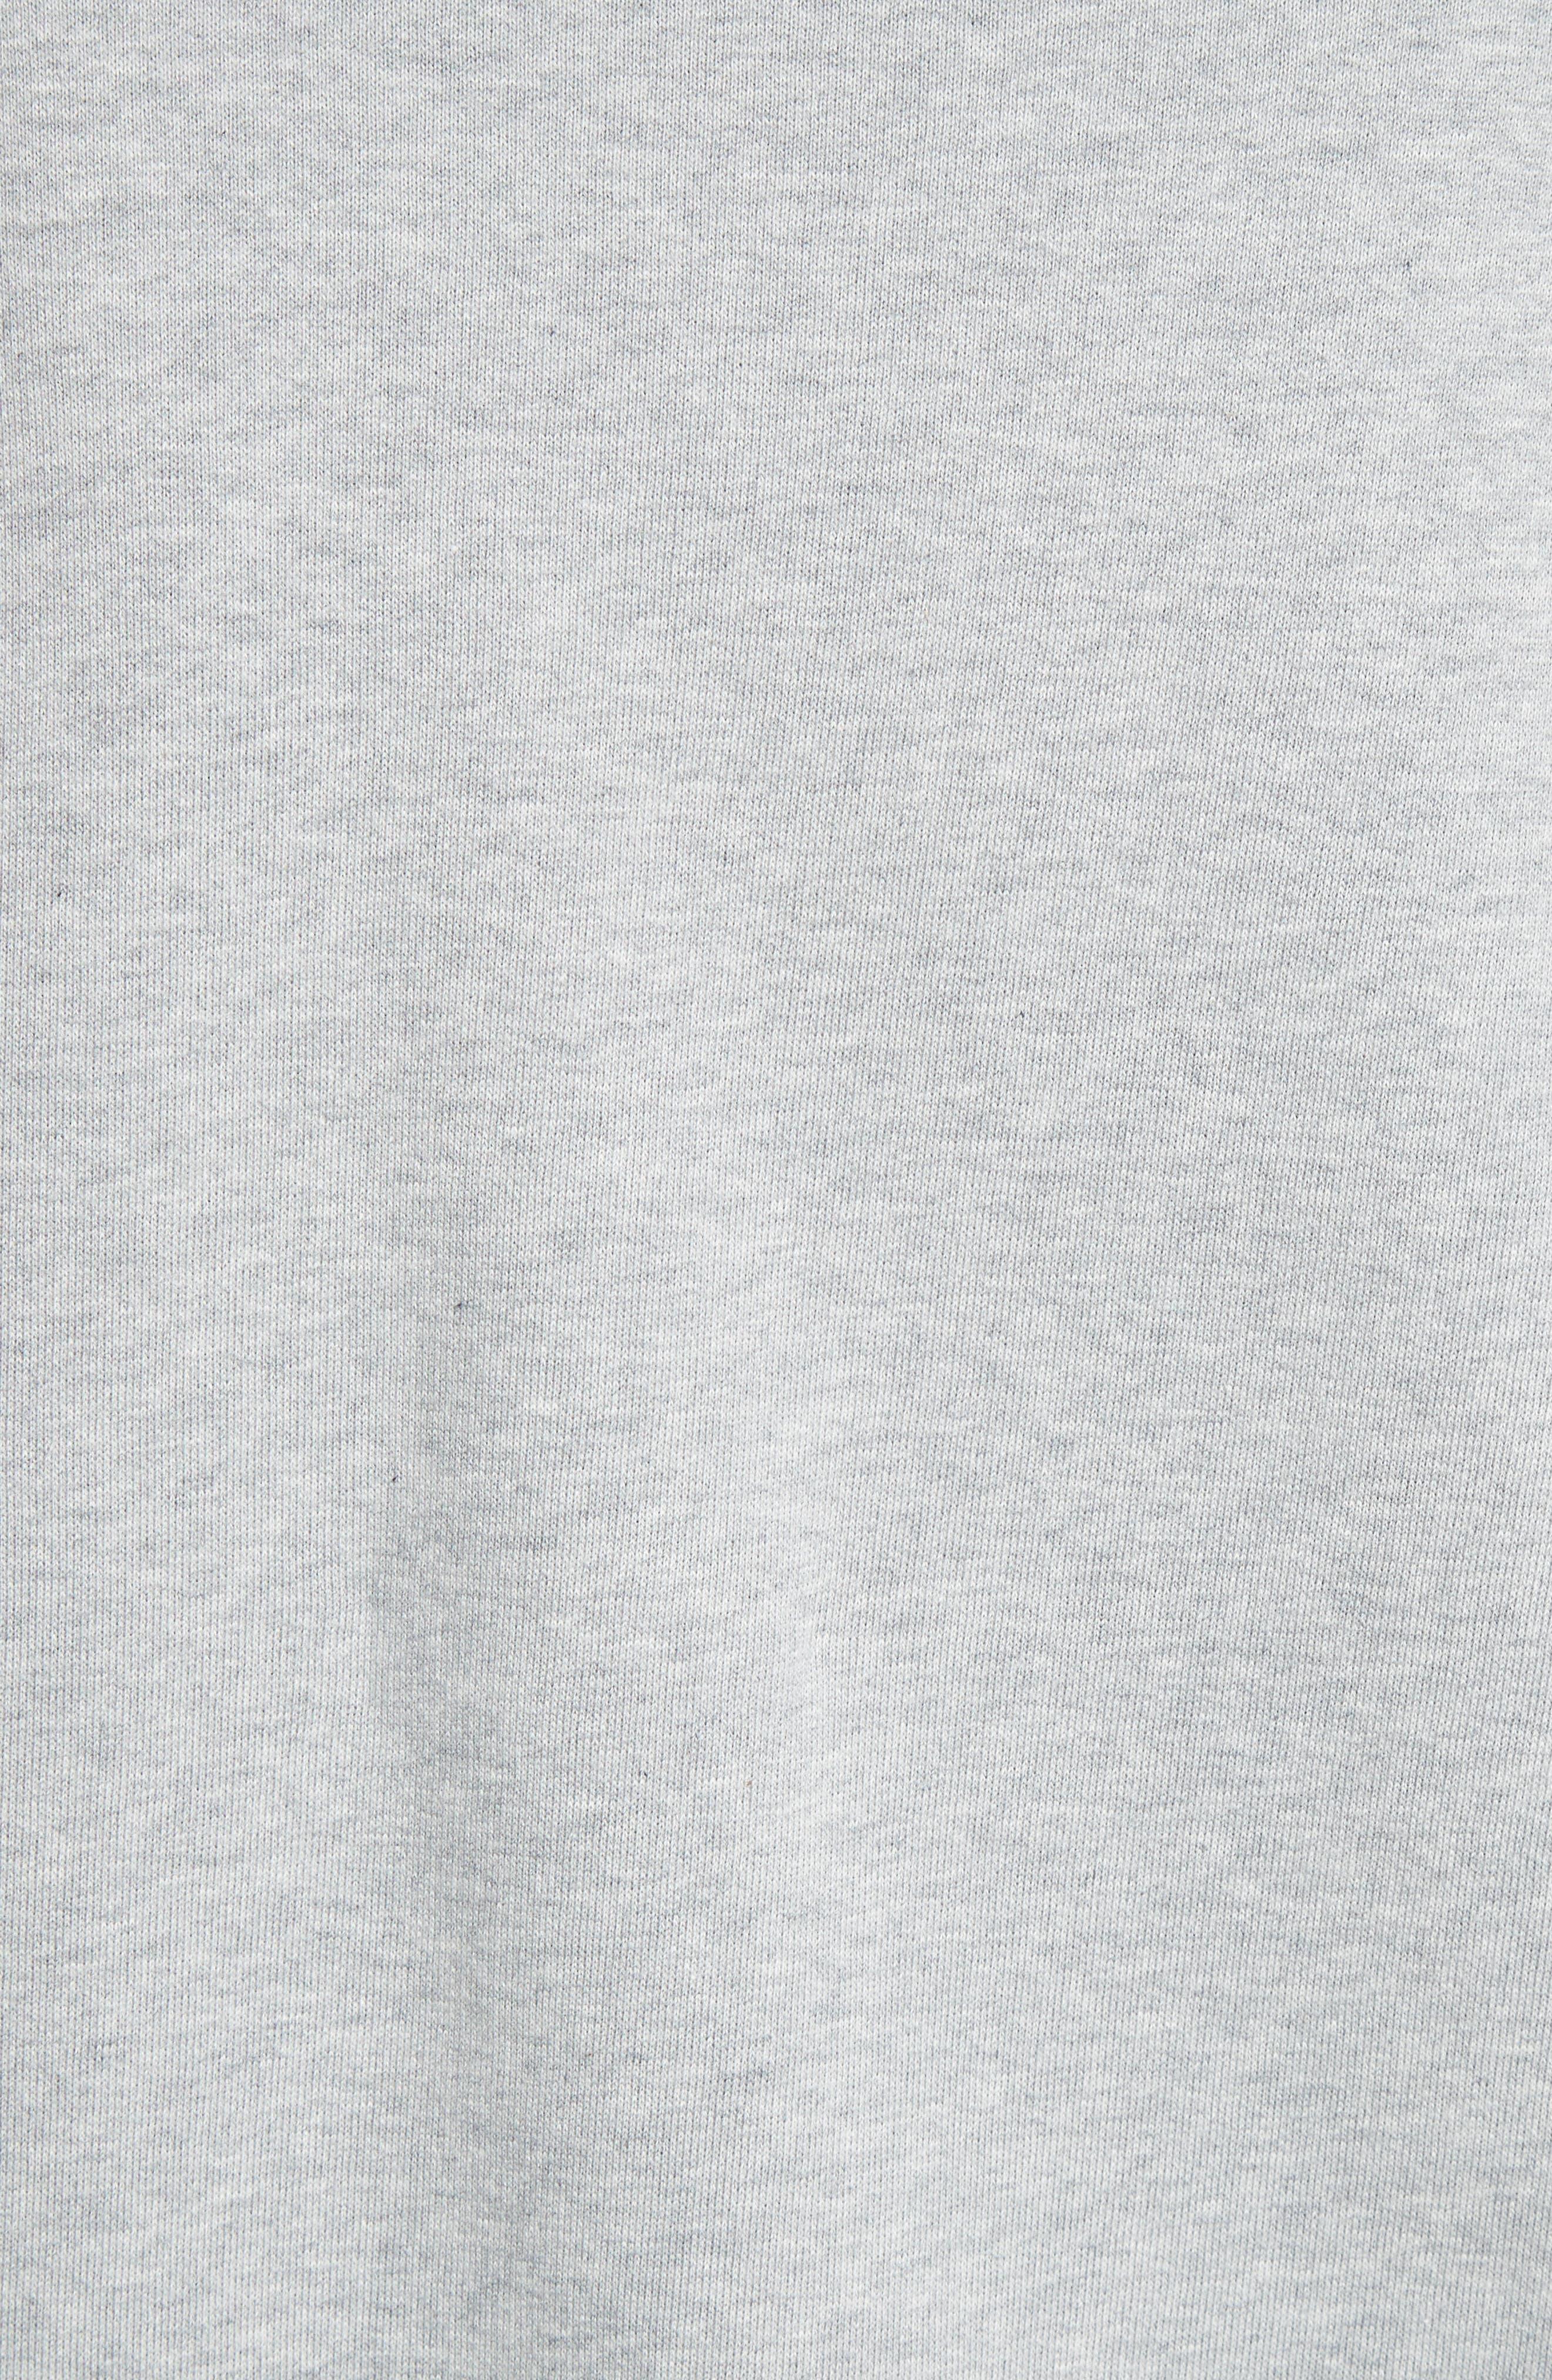 Hydrangea Patch Sweatshirt,                             Alternate thumbnail 5, color,                             050